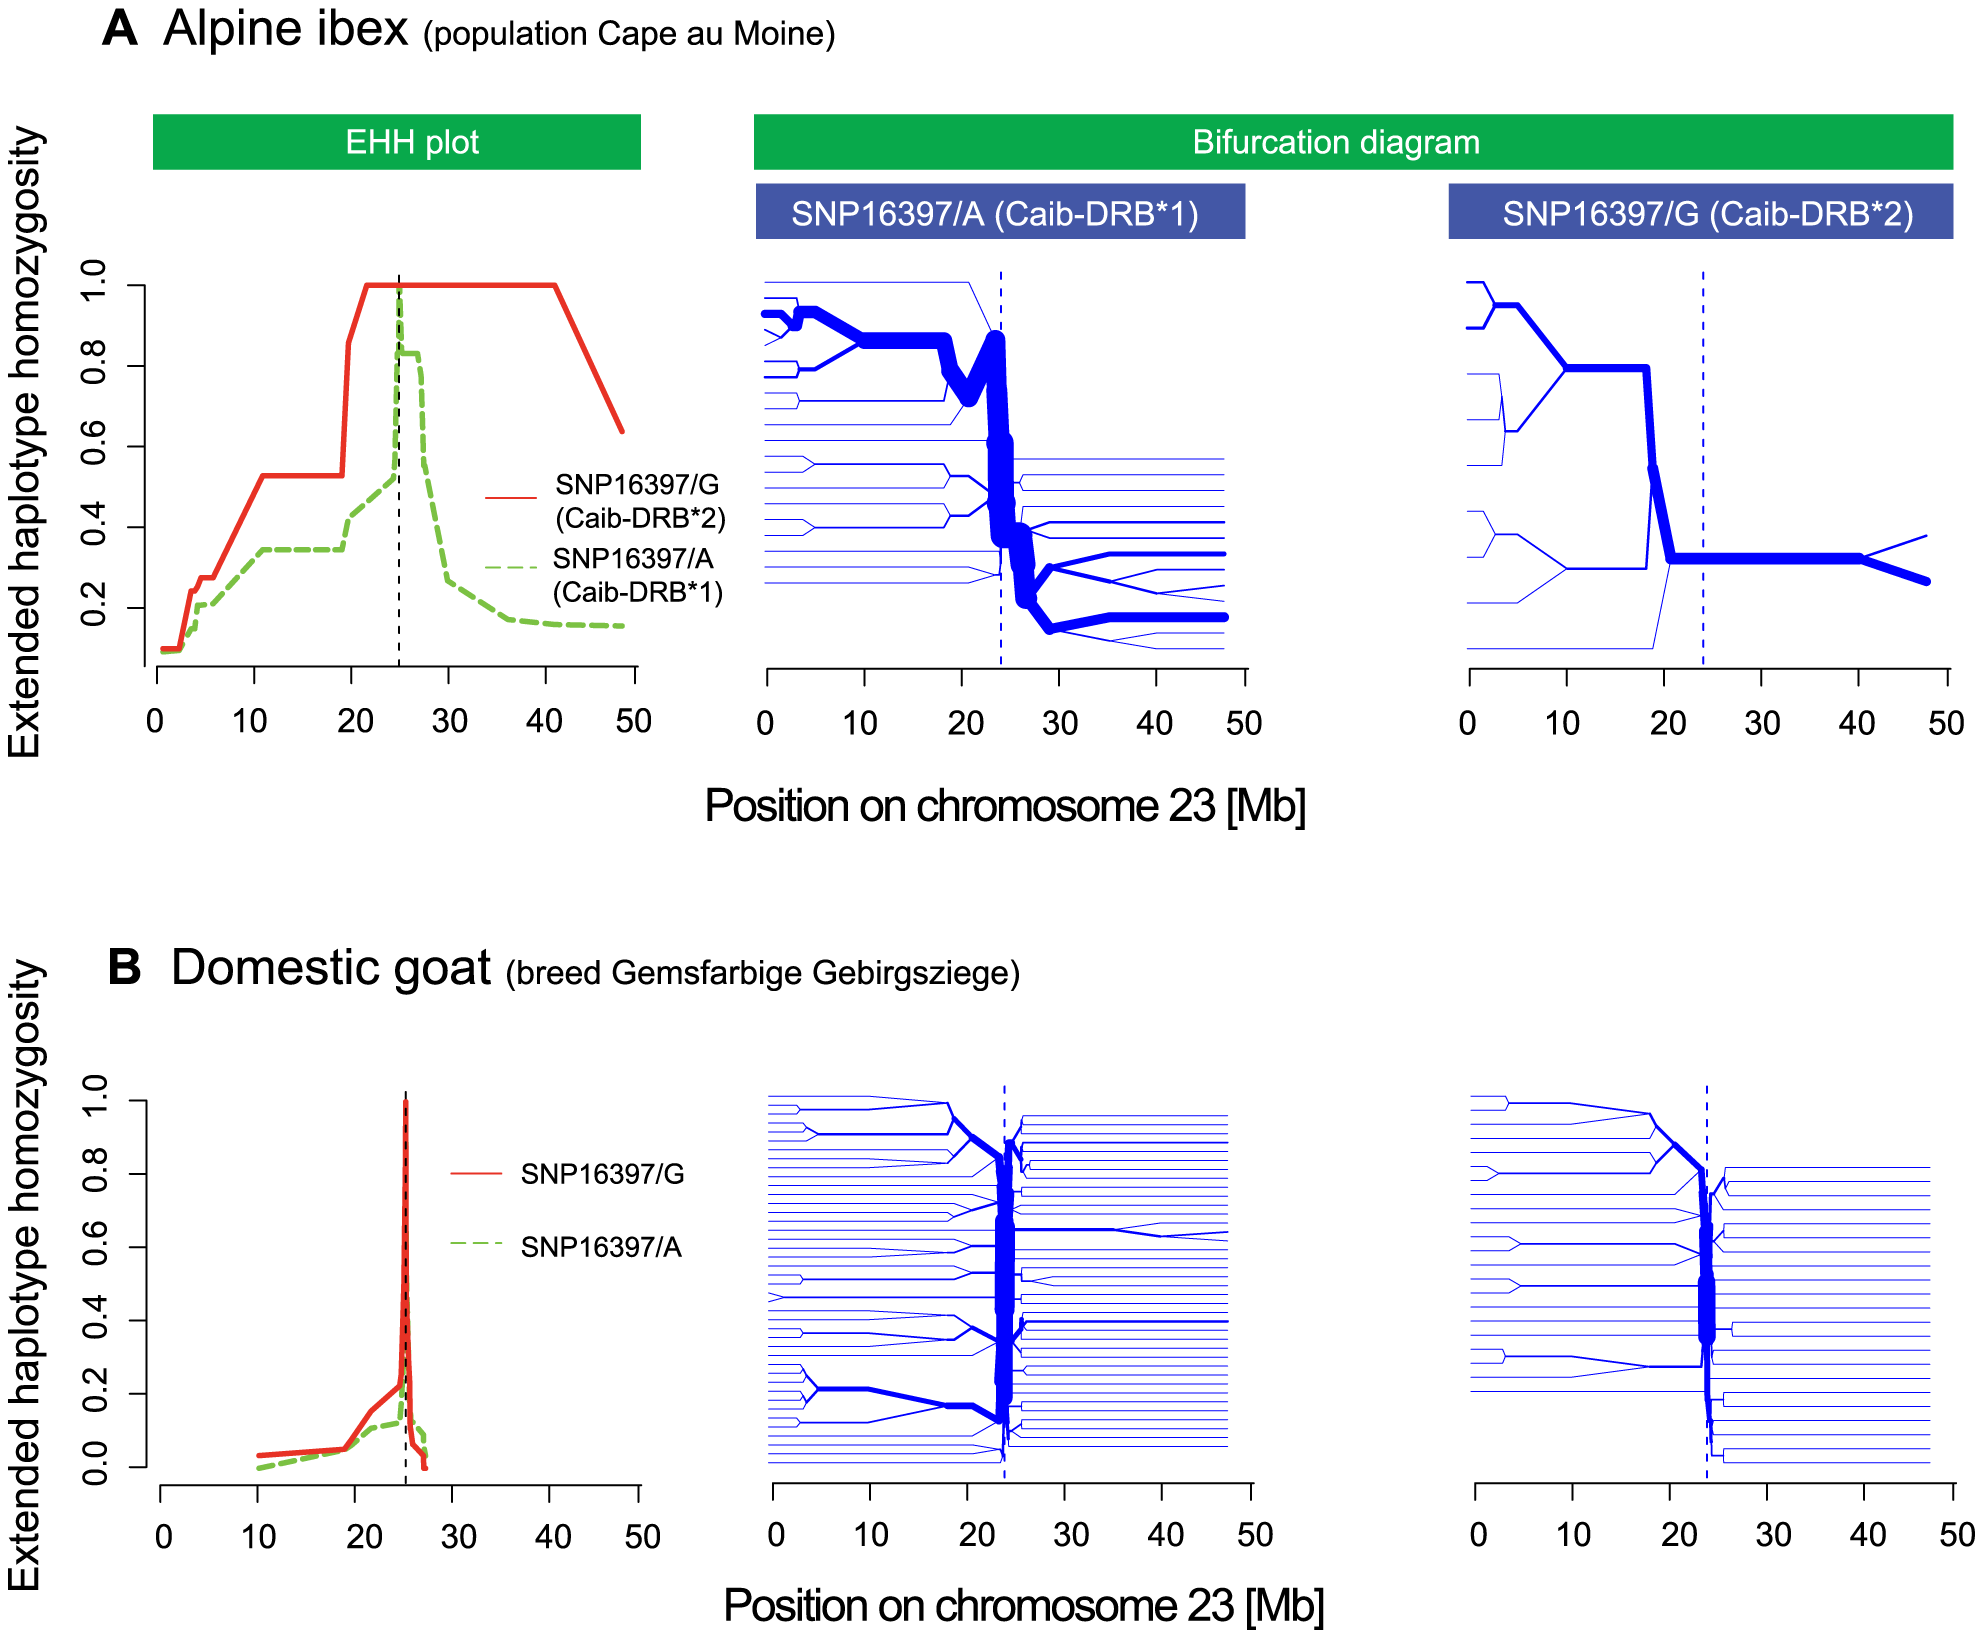 Extended haplotype homozygosity (EHH) plots and bifurcation diagrams.